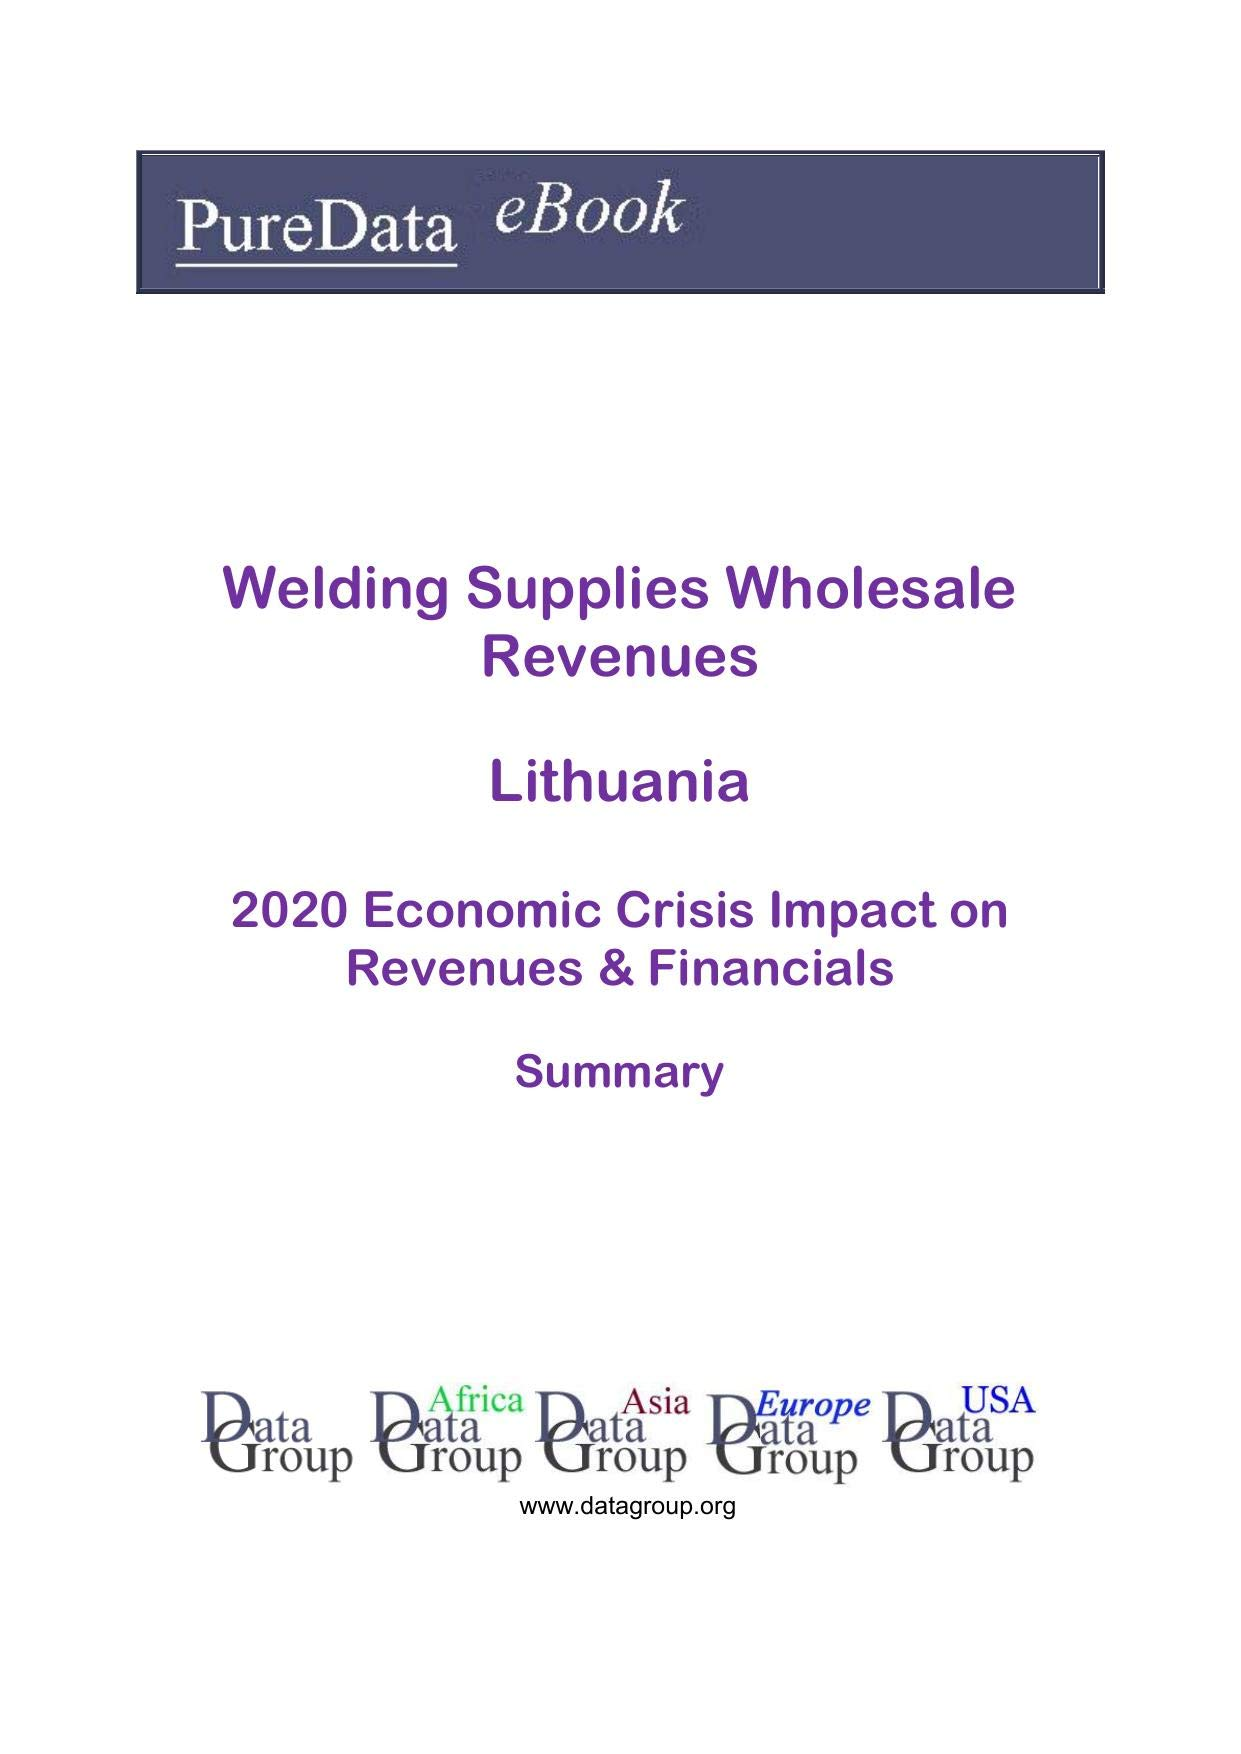 Welding Supplies Wholesale Revenues Lithuania Summary: 2020 Economic Crisis Impact on Revenues & Financials